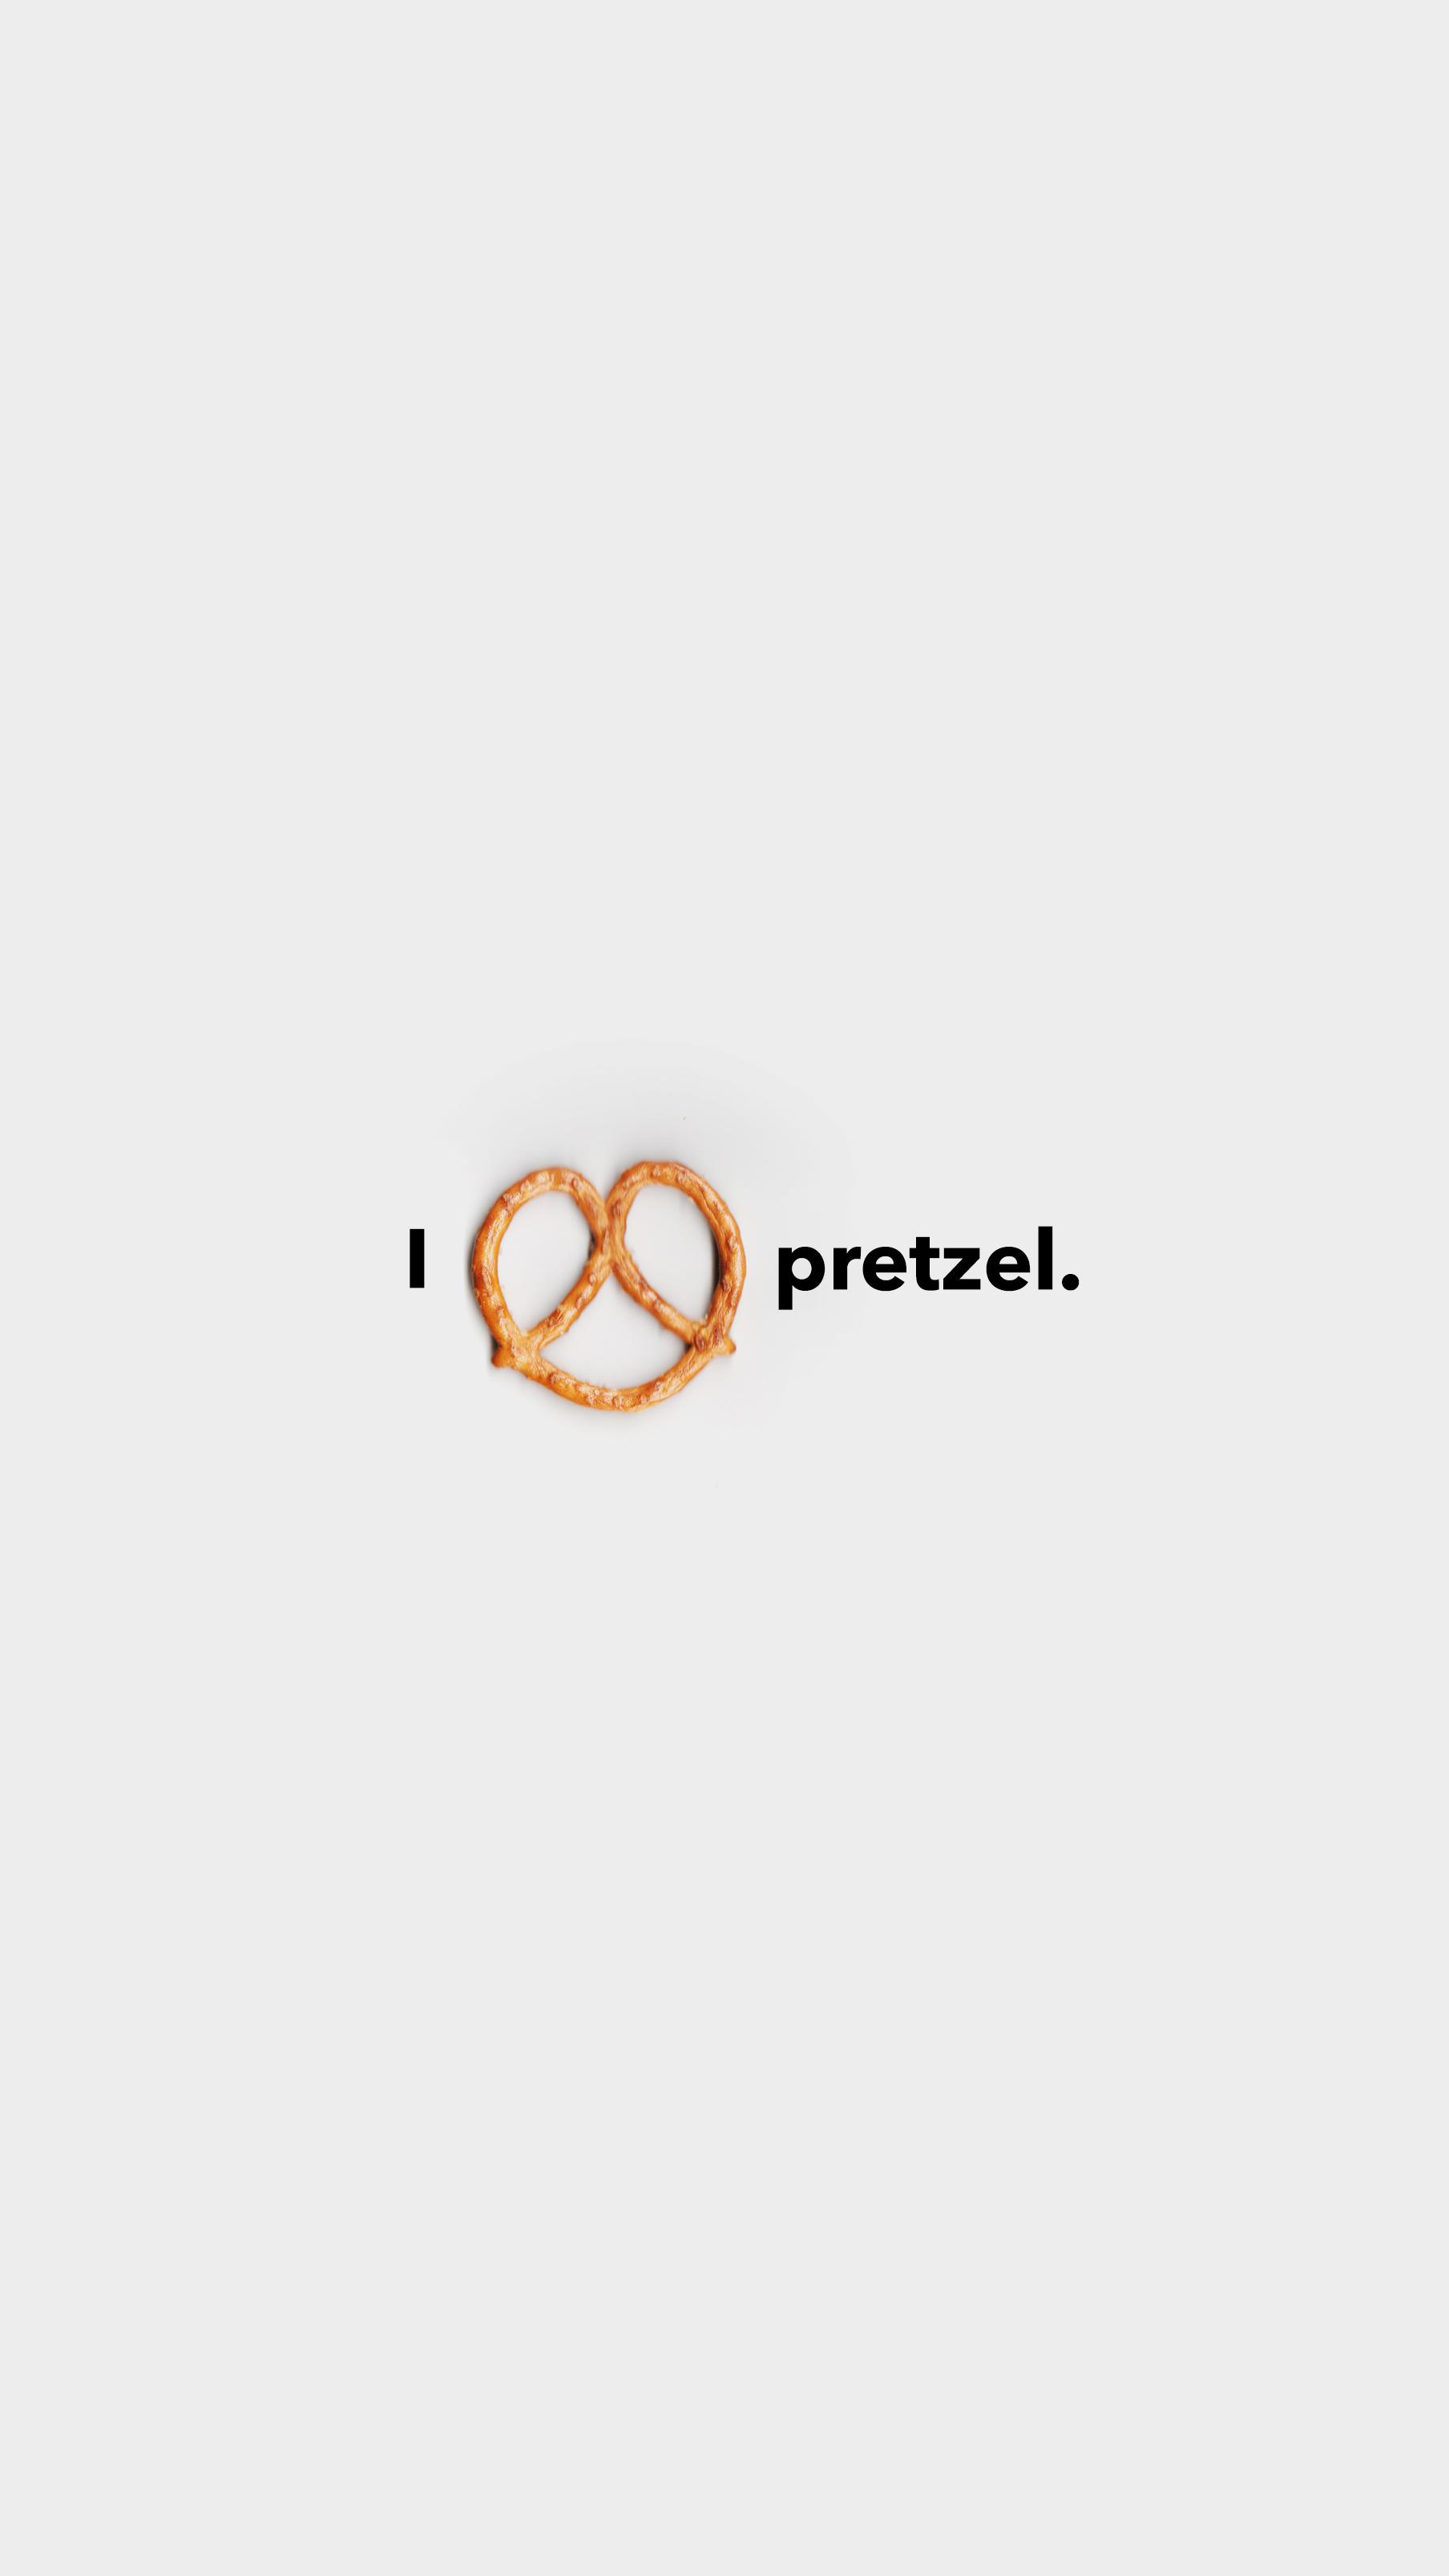 Pretzel_Vert.jpg